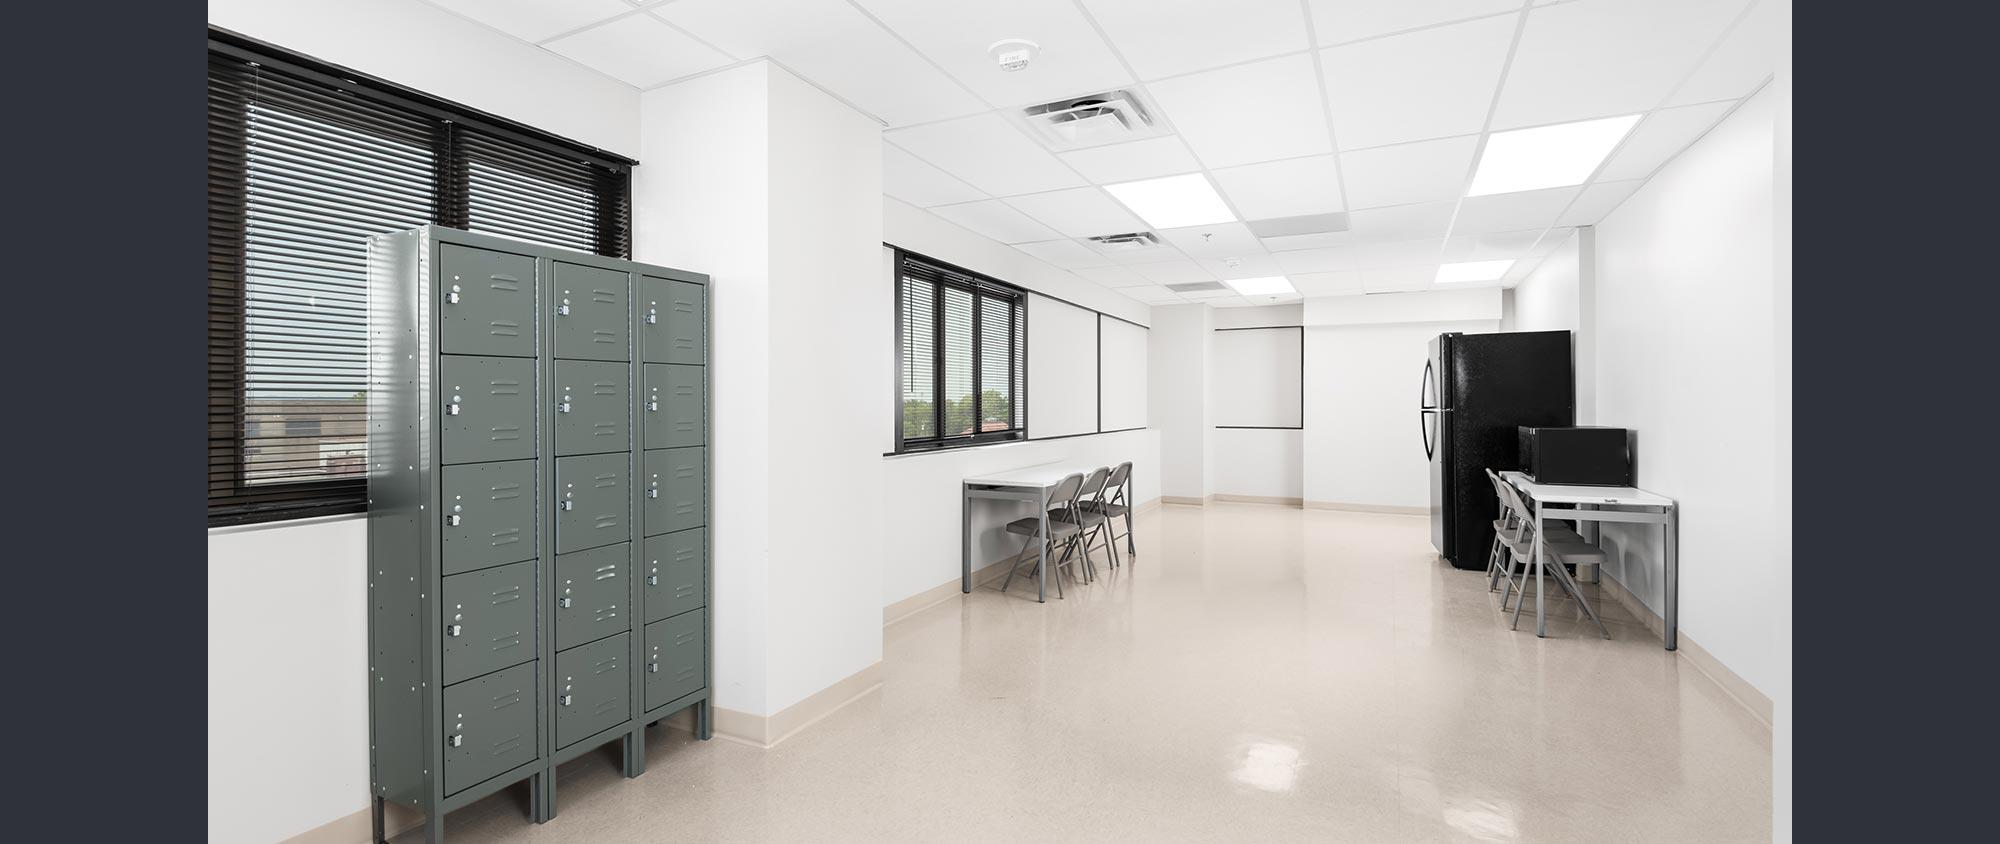 Nashville General Hospital at Meharry – COVID Unit Conversion